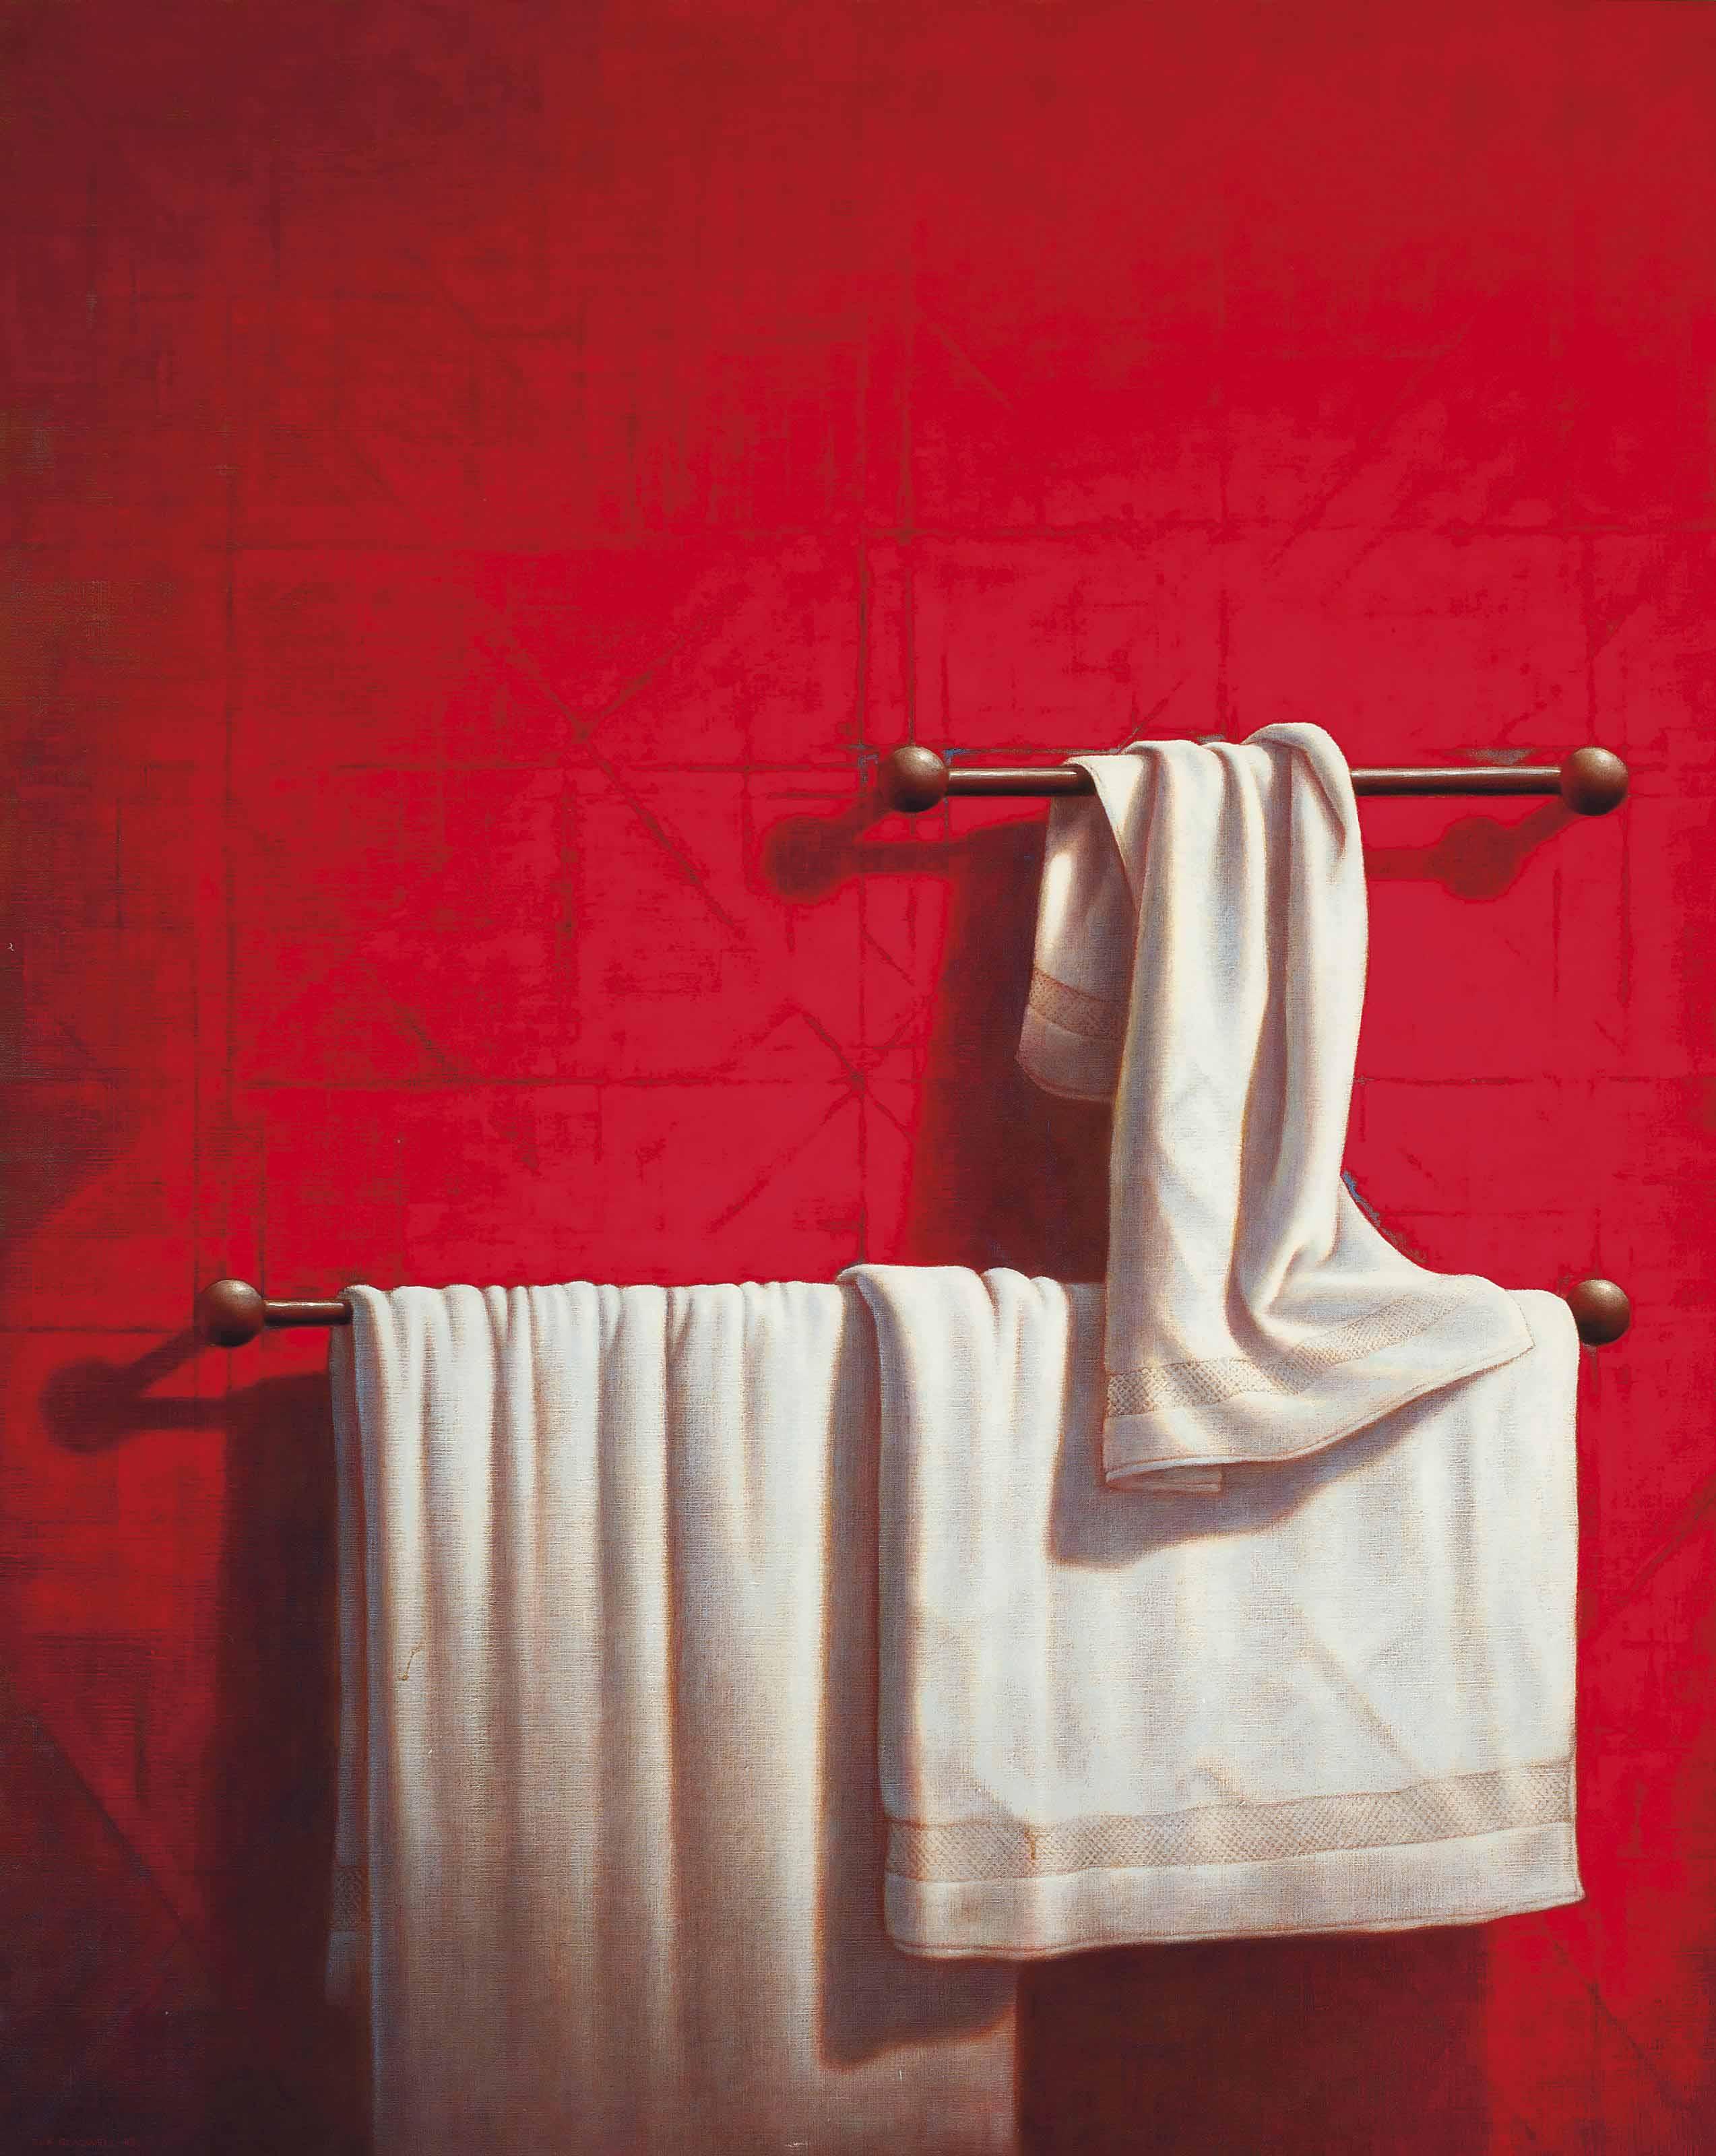 Bath towel and rail